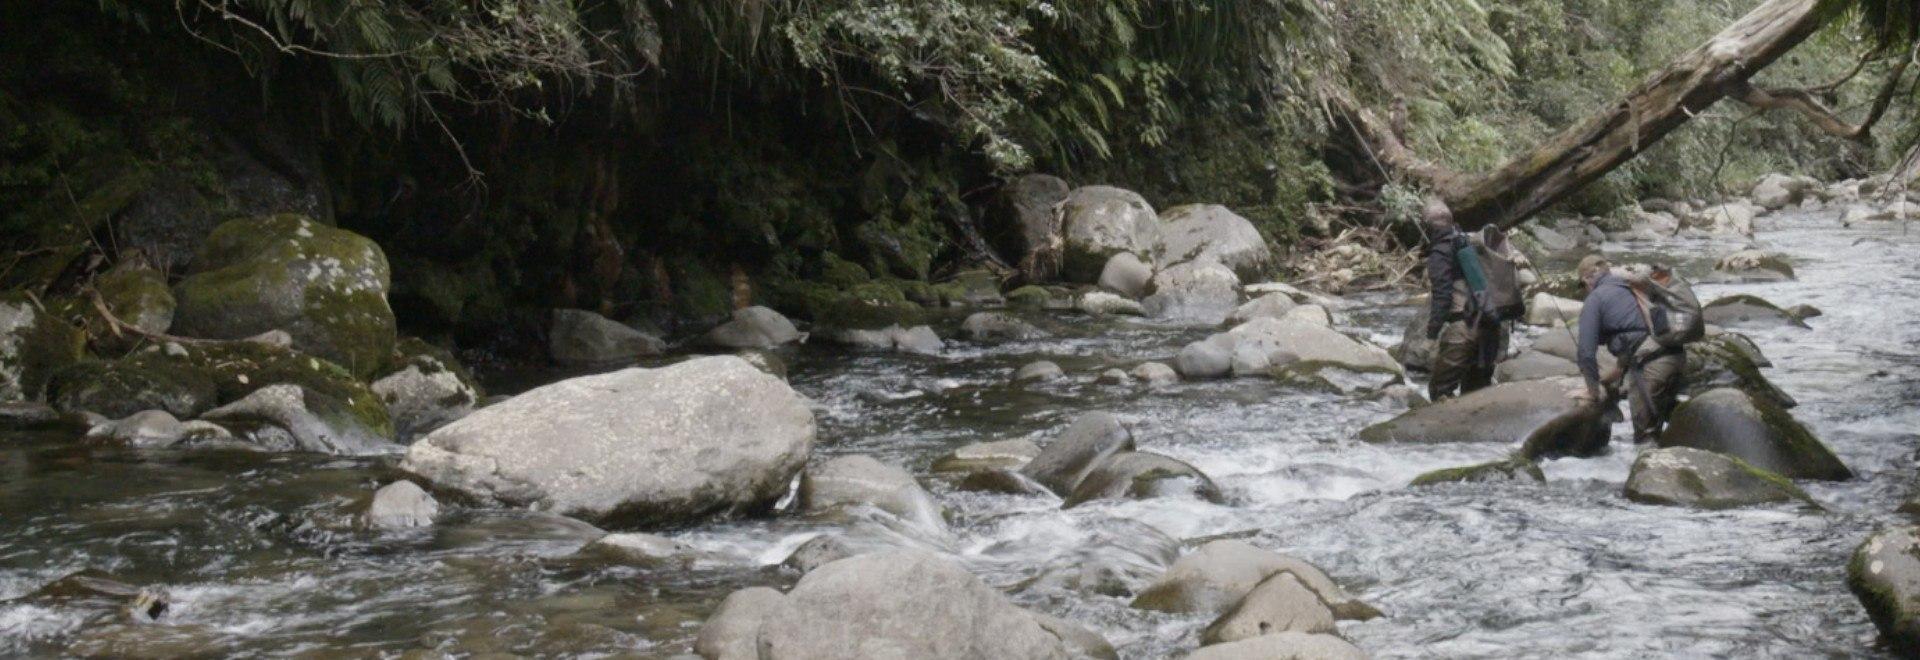 Pesca alle trote in canale. 1a parte